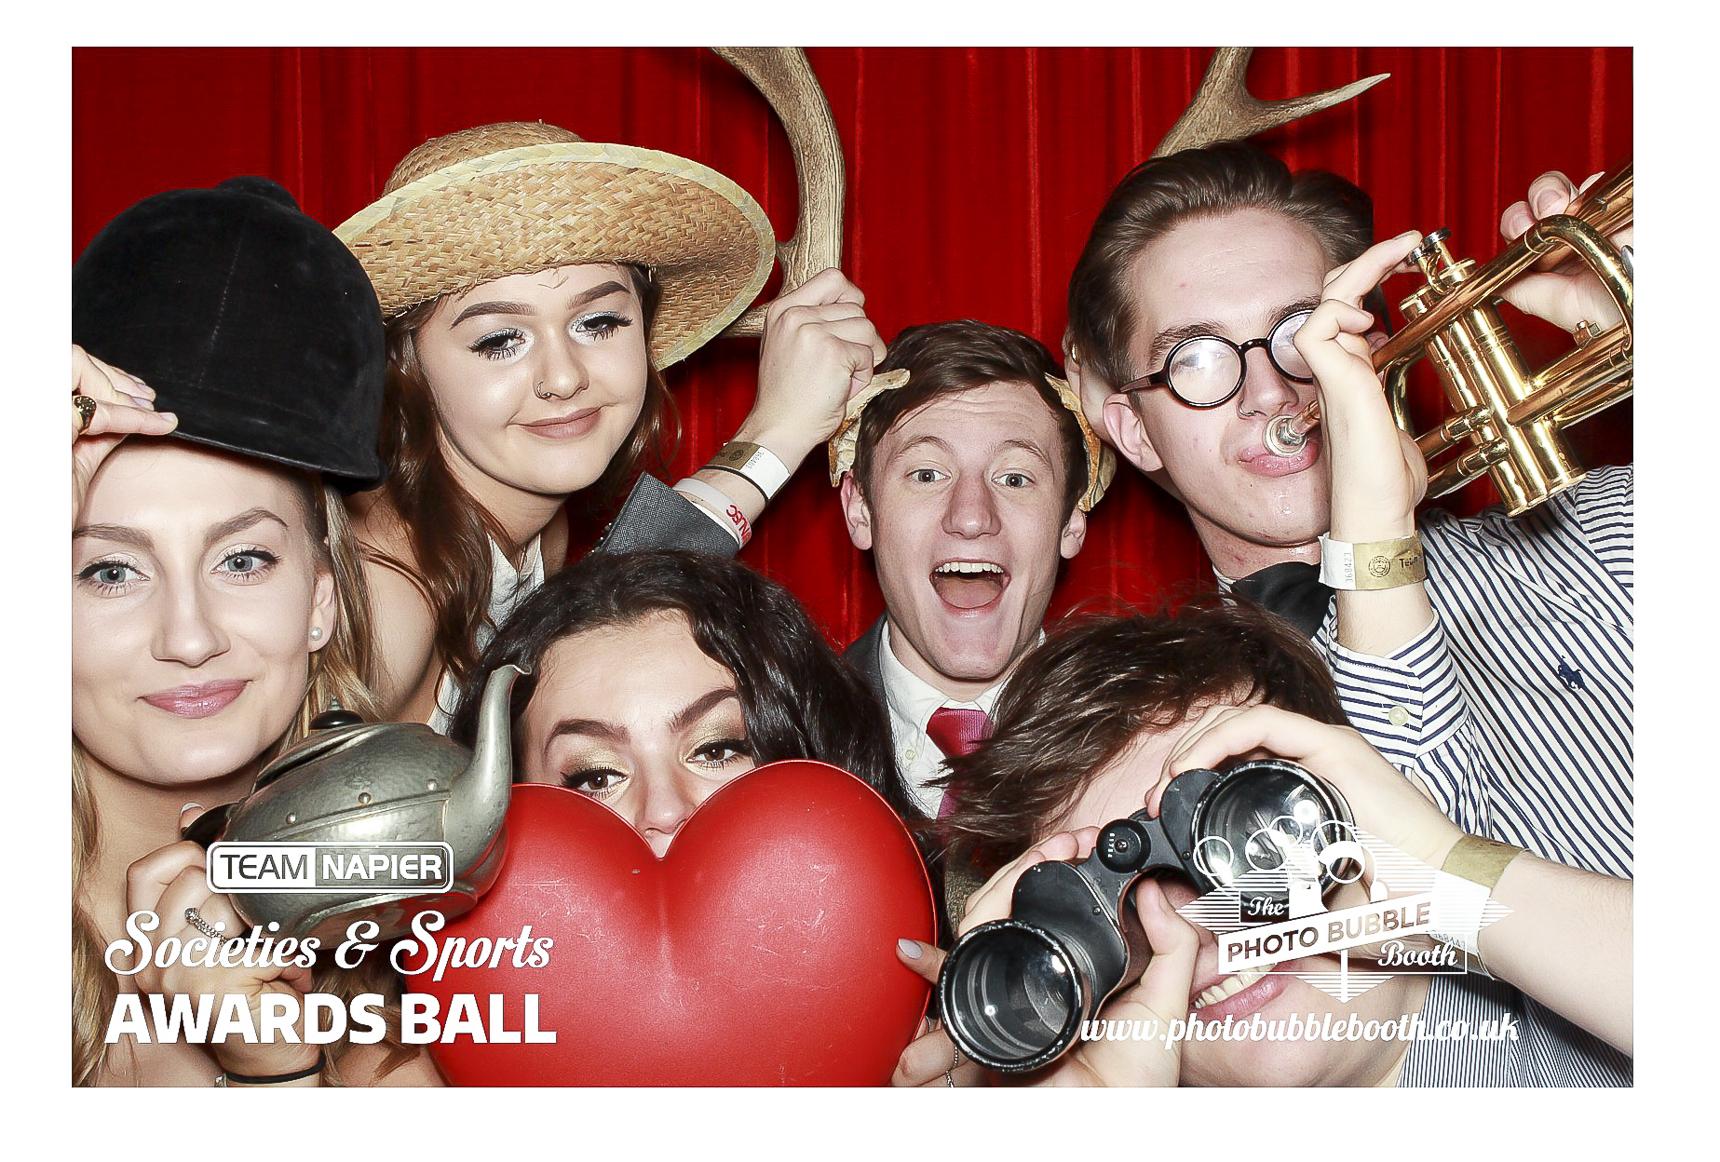 Napier Societies & Sports Awards_10.JPG